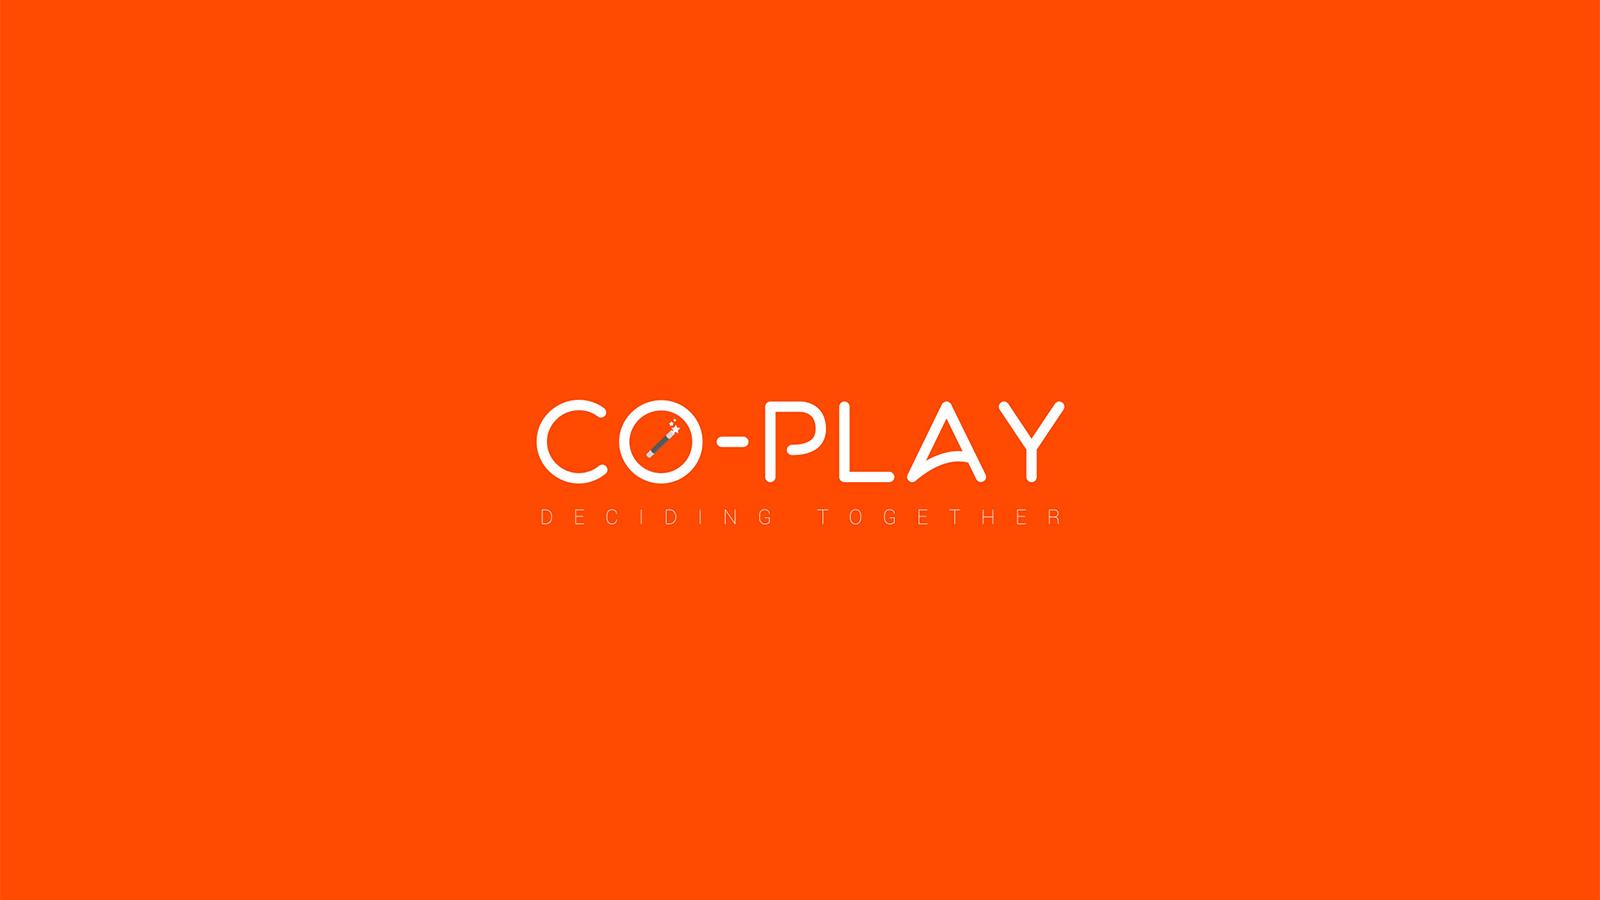 Logo design for startup עיצוב לוגו לסטארטאפ co-play